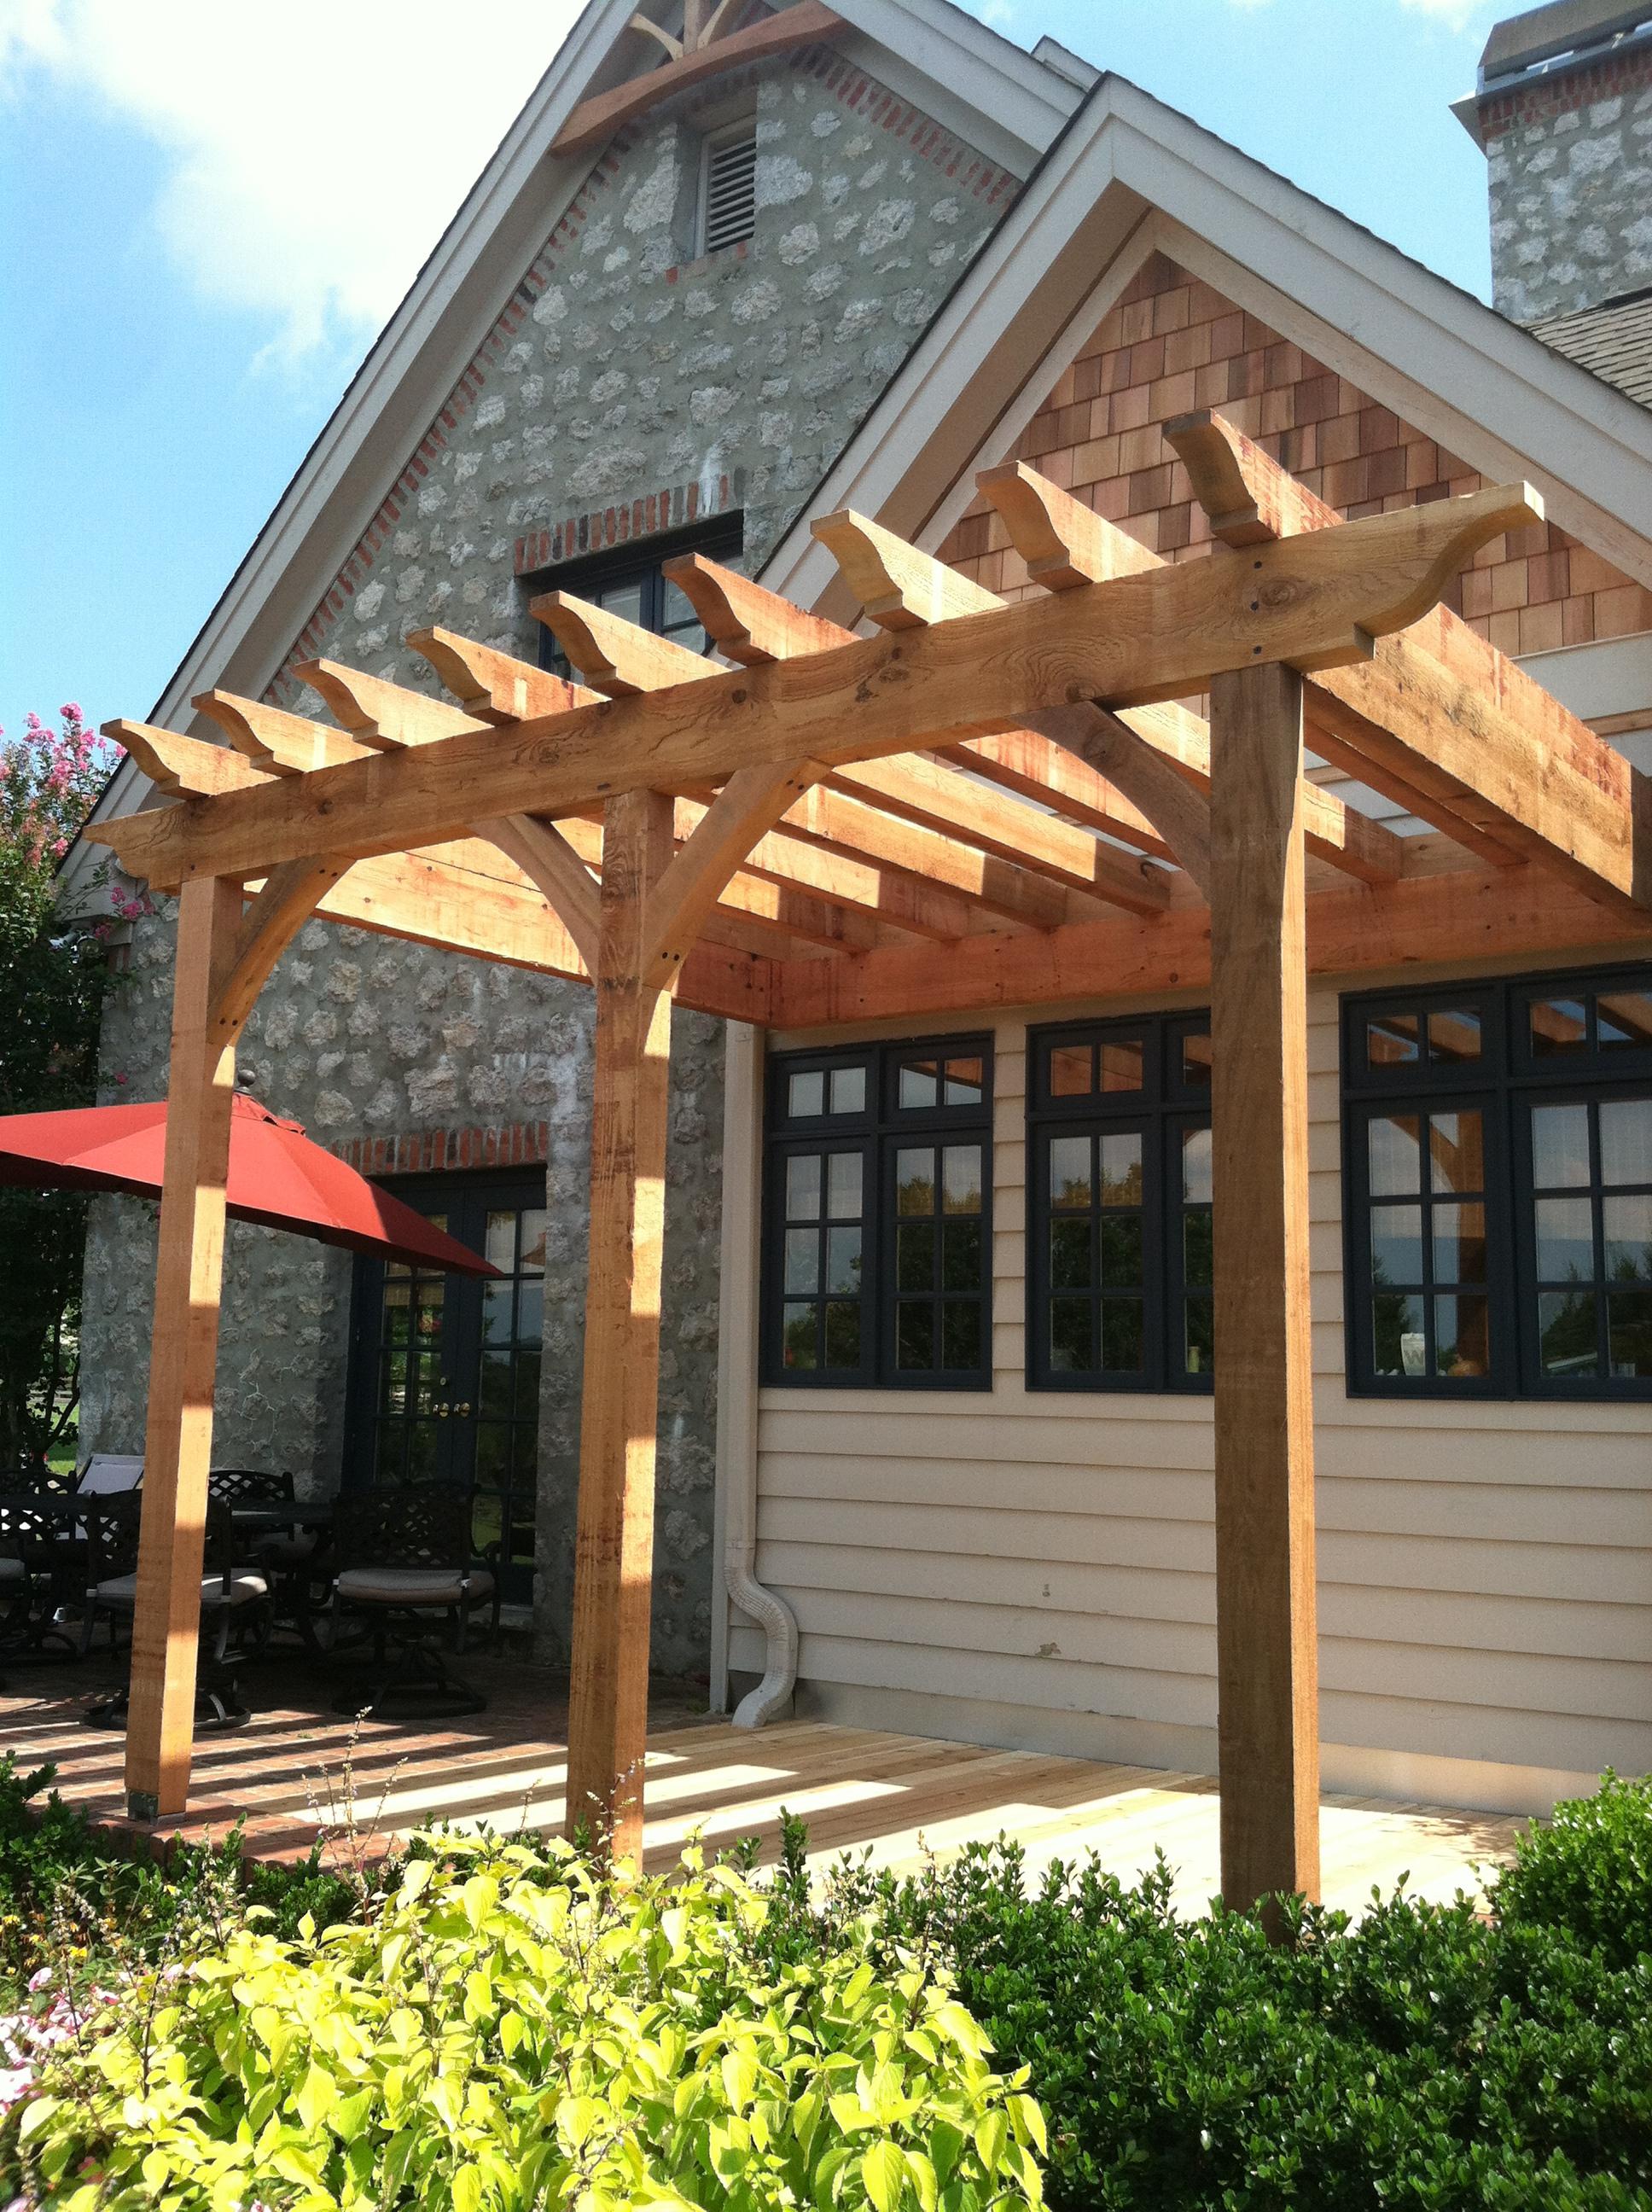 Charming Decks | Screen Porches | Sunrooms | Covered Patios | Trellis | Pergolas  Exterior Repairs | Siding | Windows U0026 Doors | Gutters | Roofing | Painting